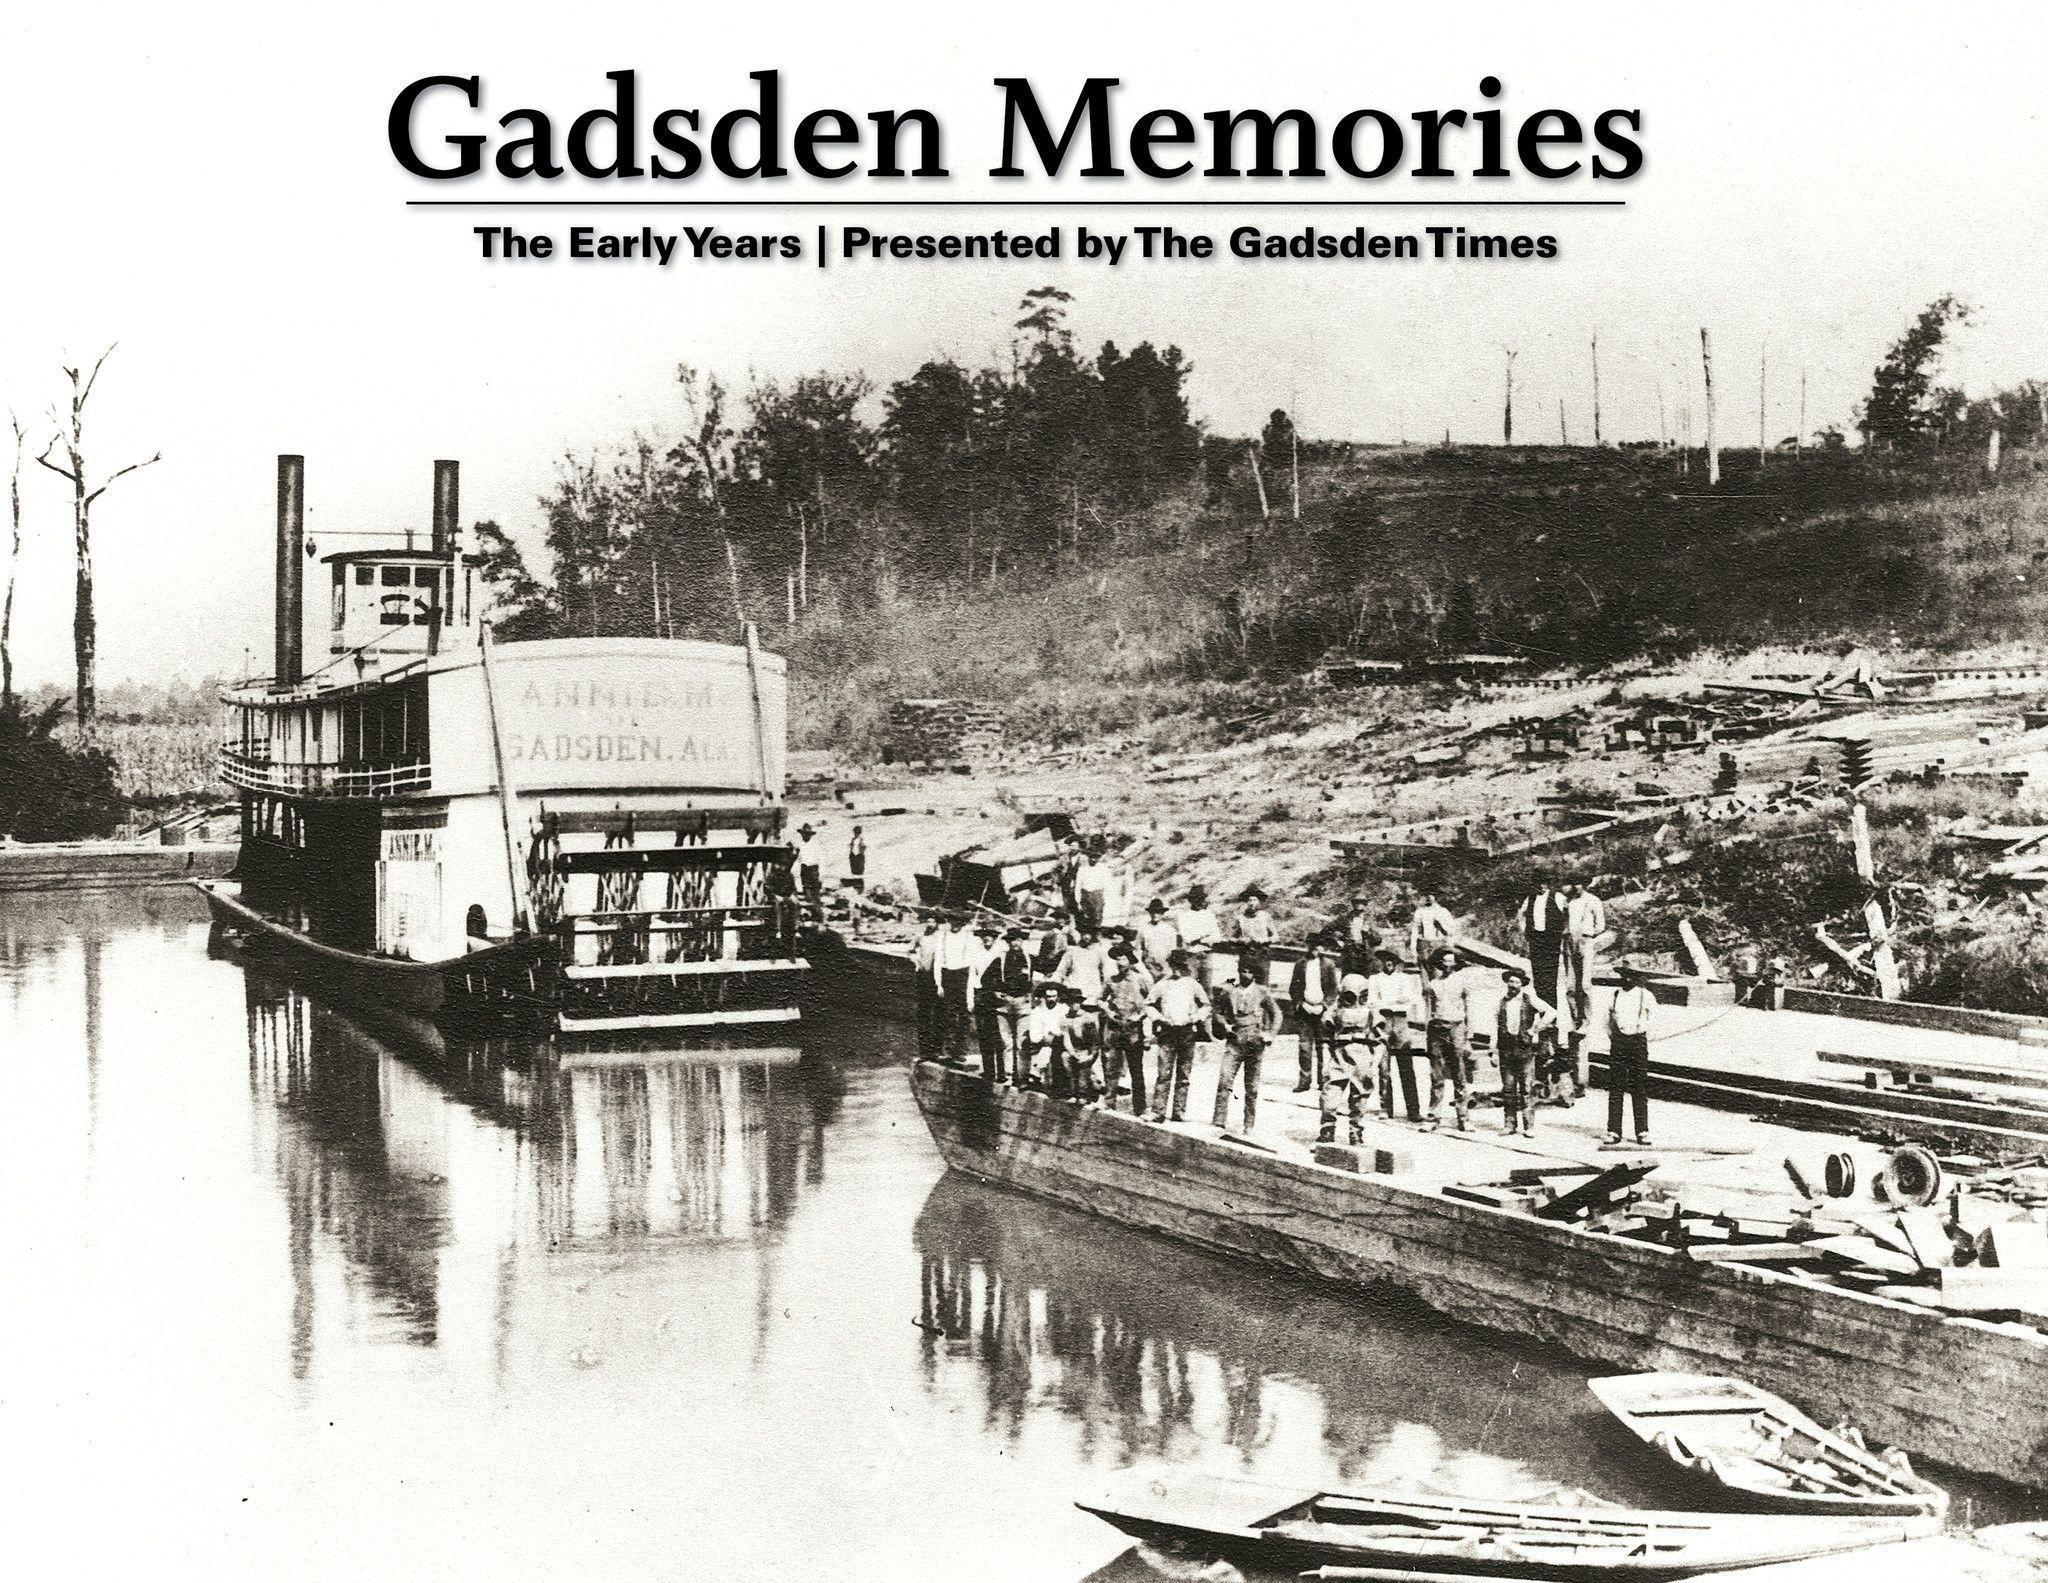 Gadsden Memories: The Early Years